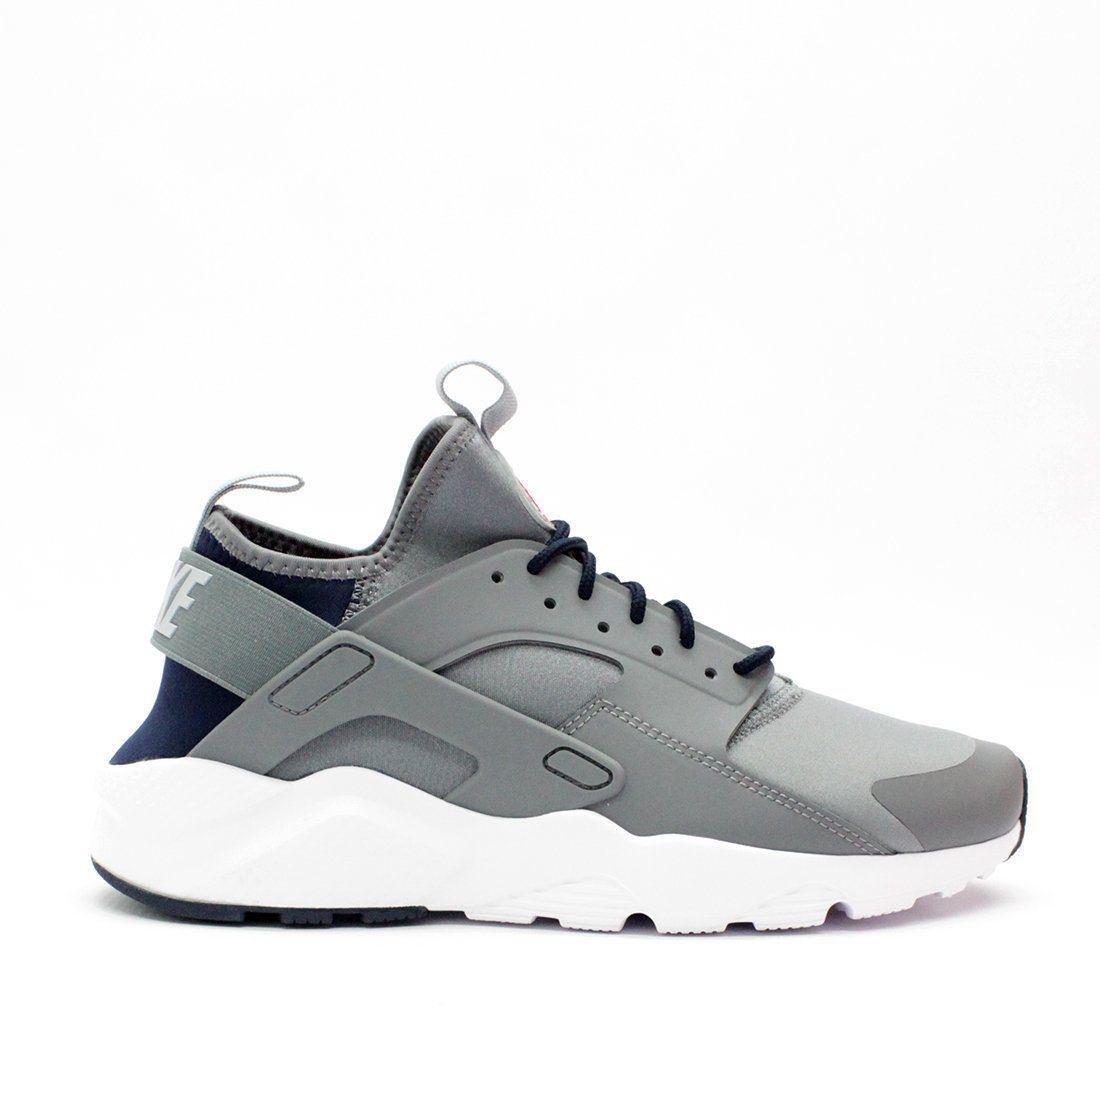 e057a1cf2b ... wholesale nike trainers nike air huarache run ultra grey 819685 013 in  gray a2332 a0577